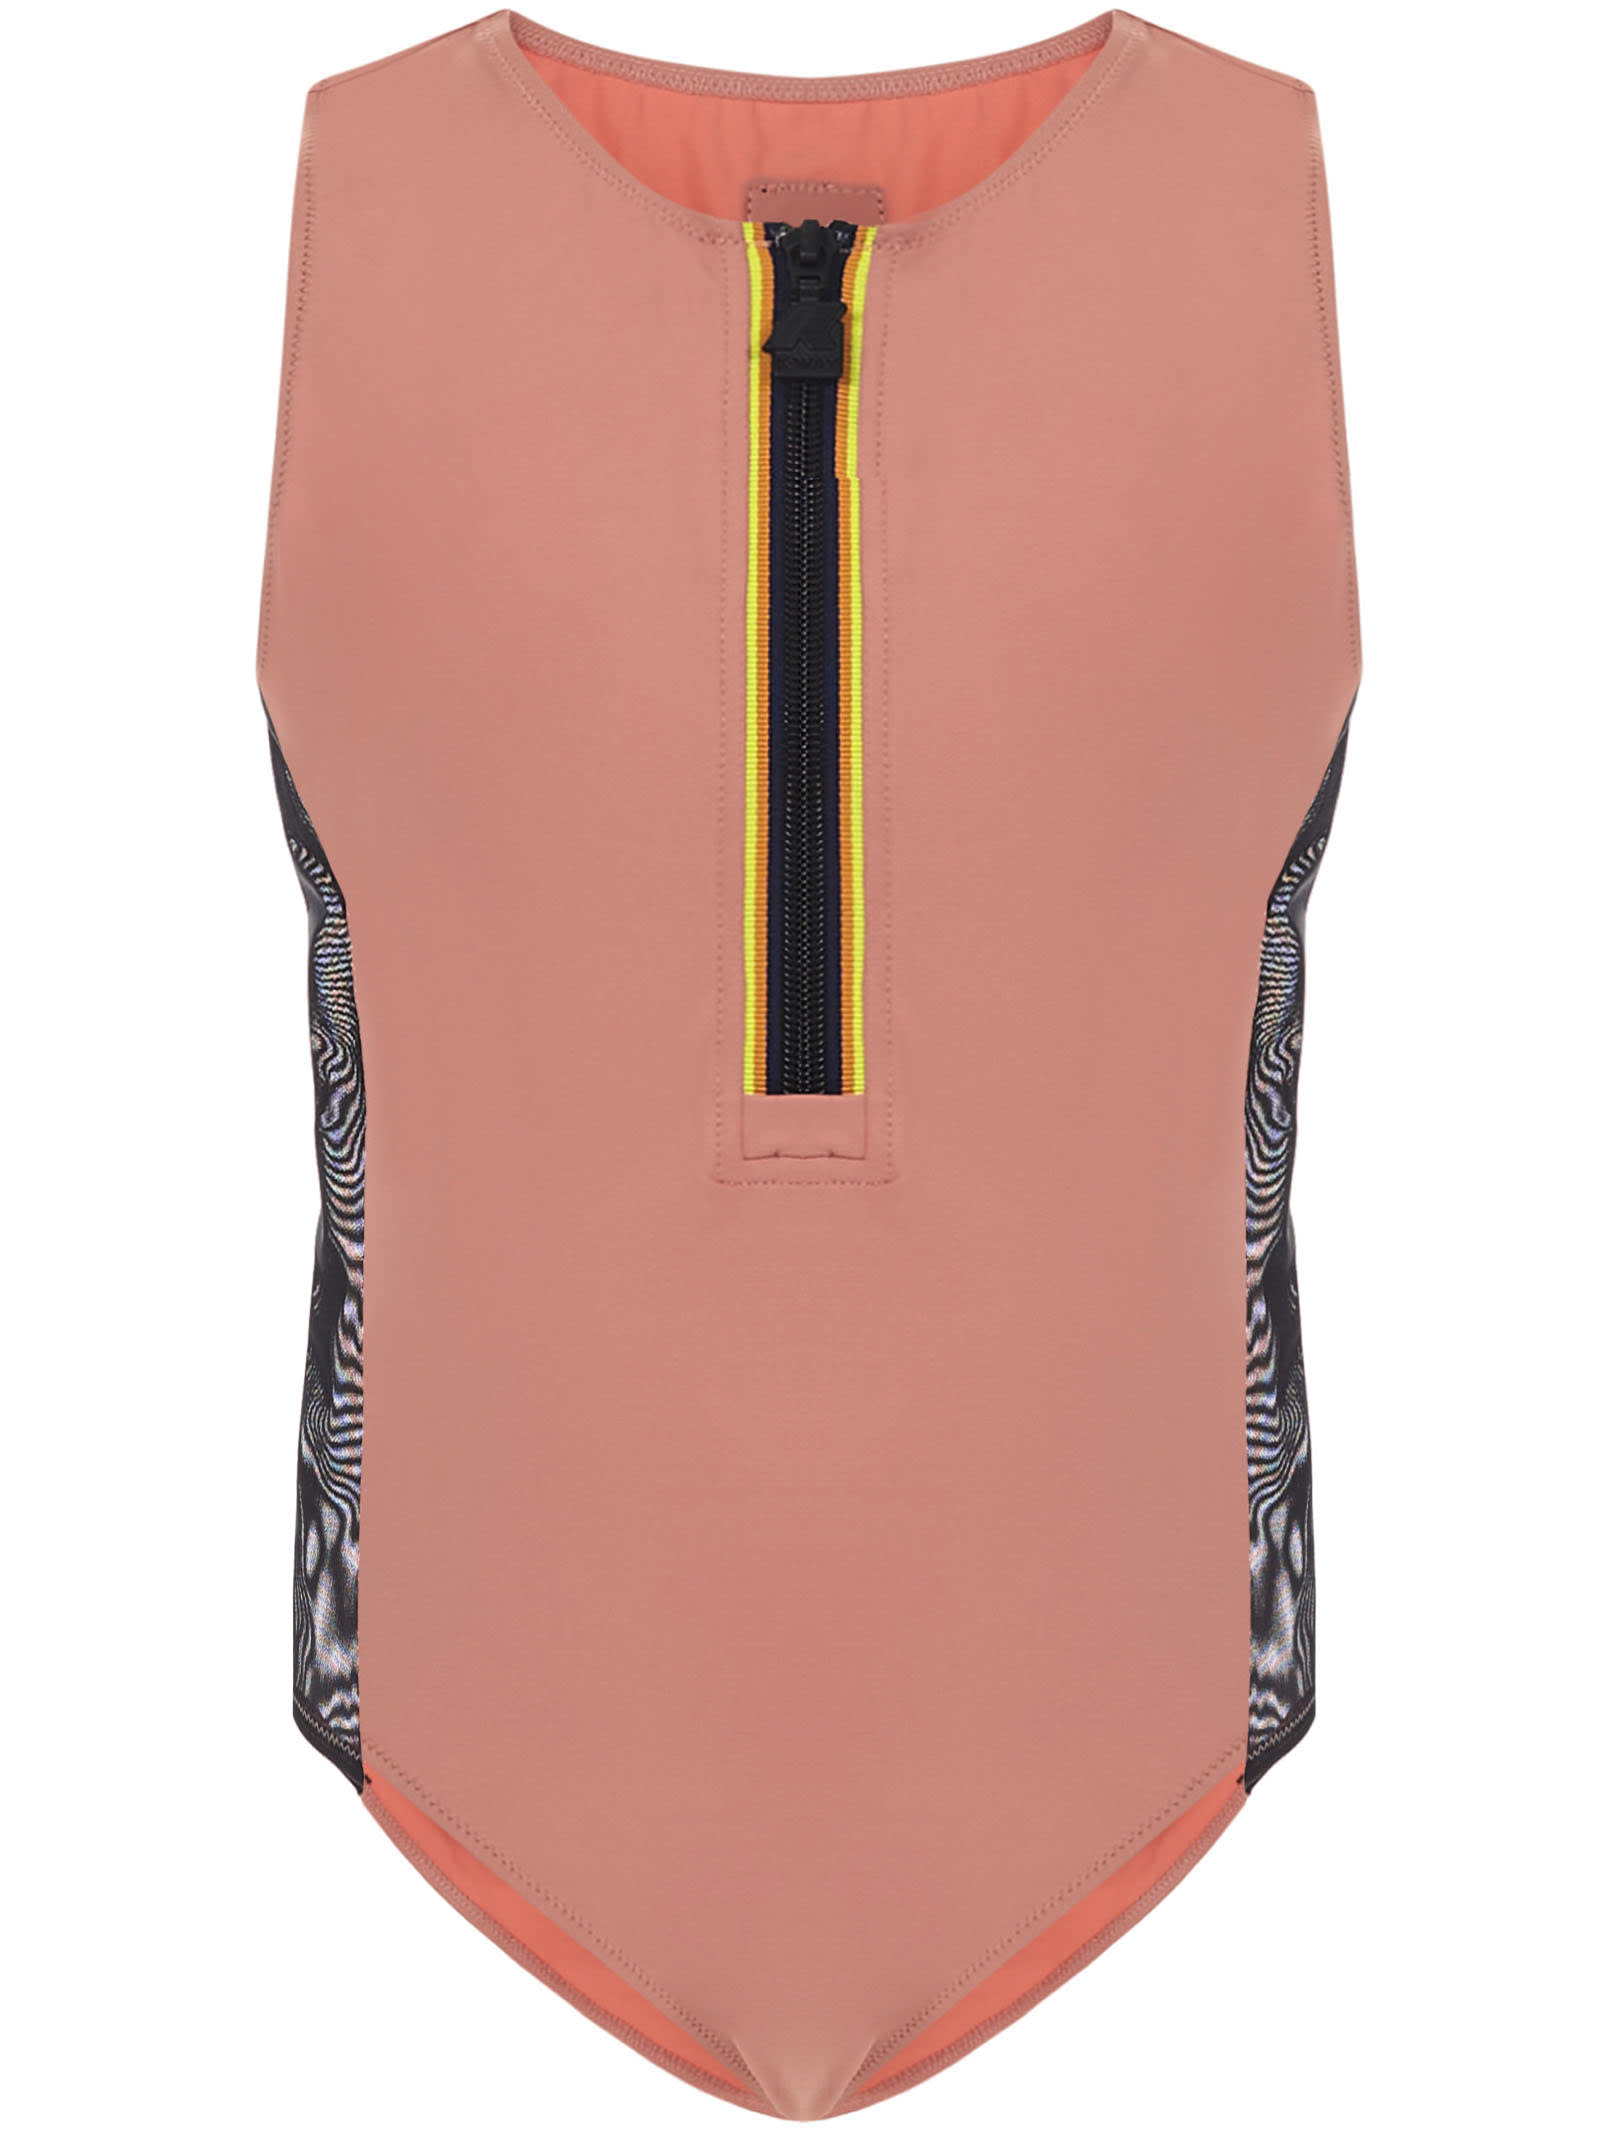 Junior X Mariacarla Boscono Swimsuit